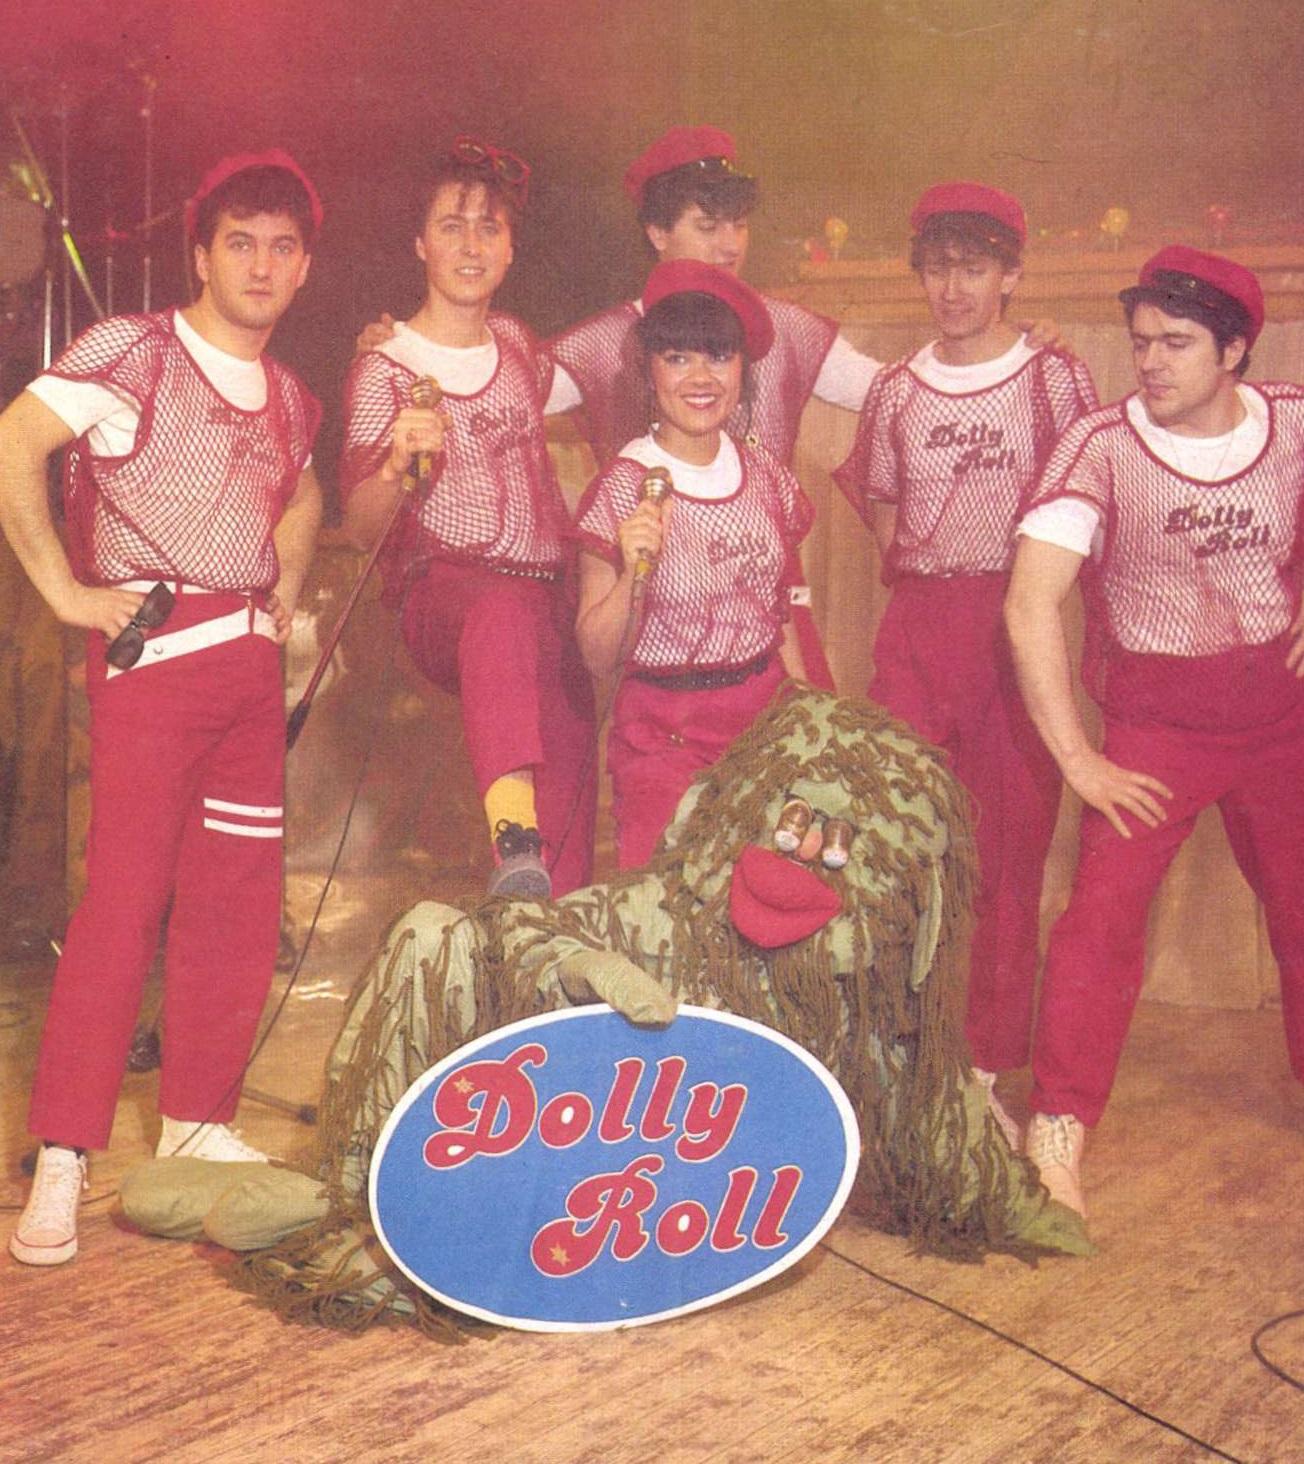 idokapszula_nb_i_1983_84_magyarorszag_spanyolorszag_dolly_roll.jpg